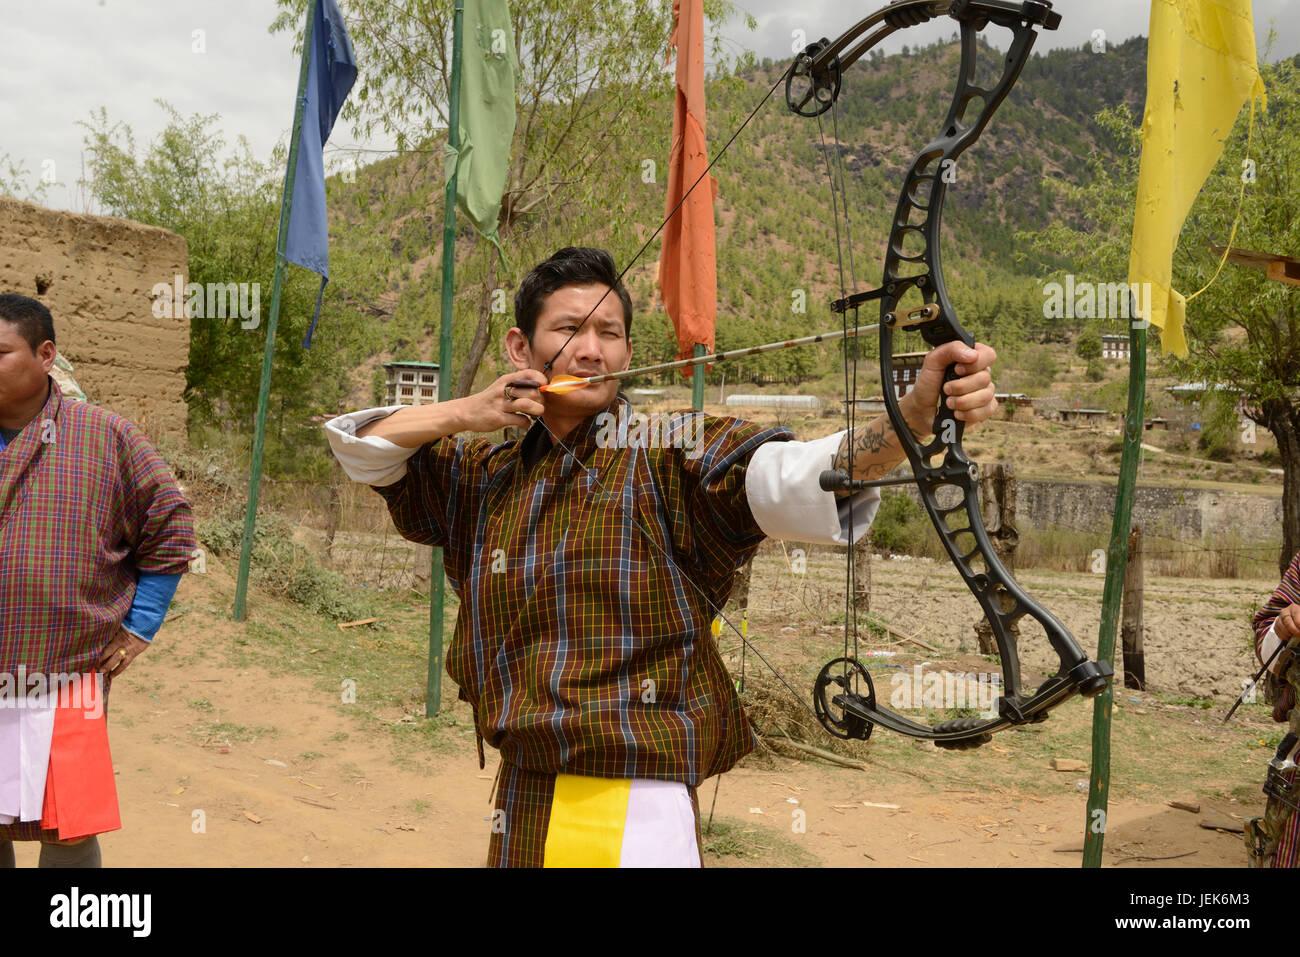 Man sport national de tir à l'arc, Thimphu, Bhoutan, Asie Photo Stock